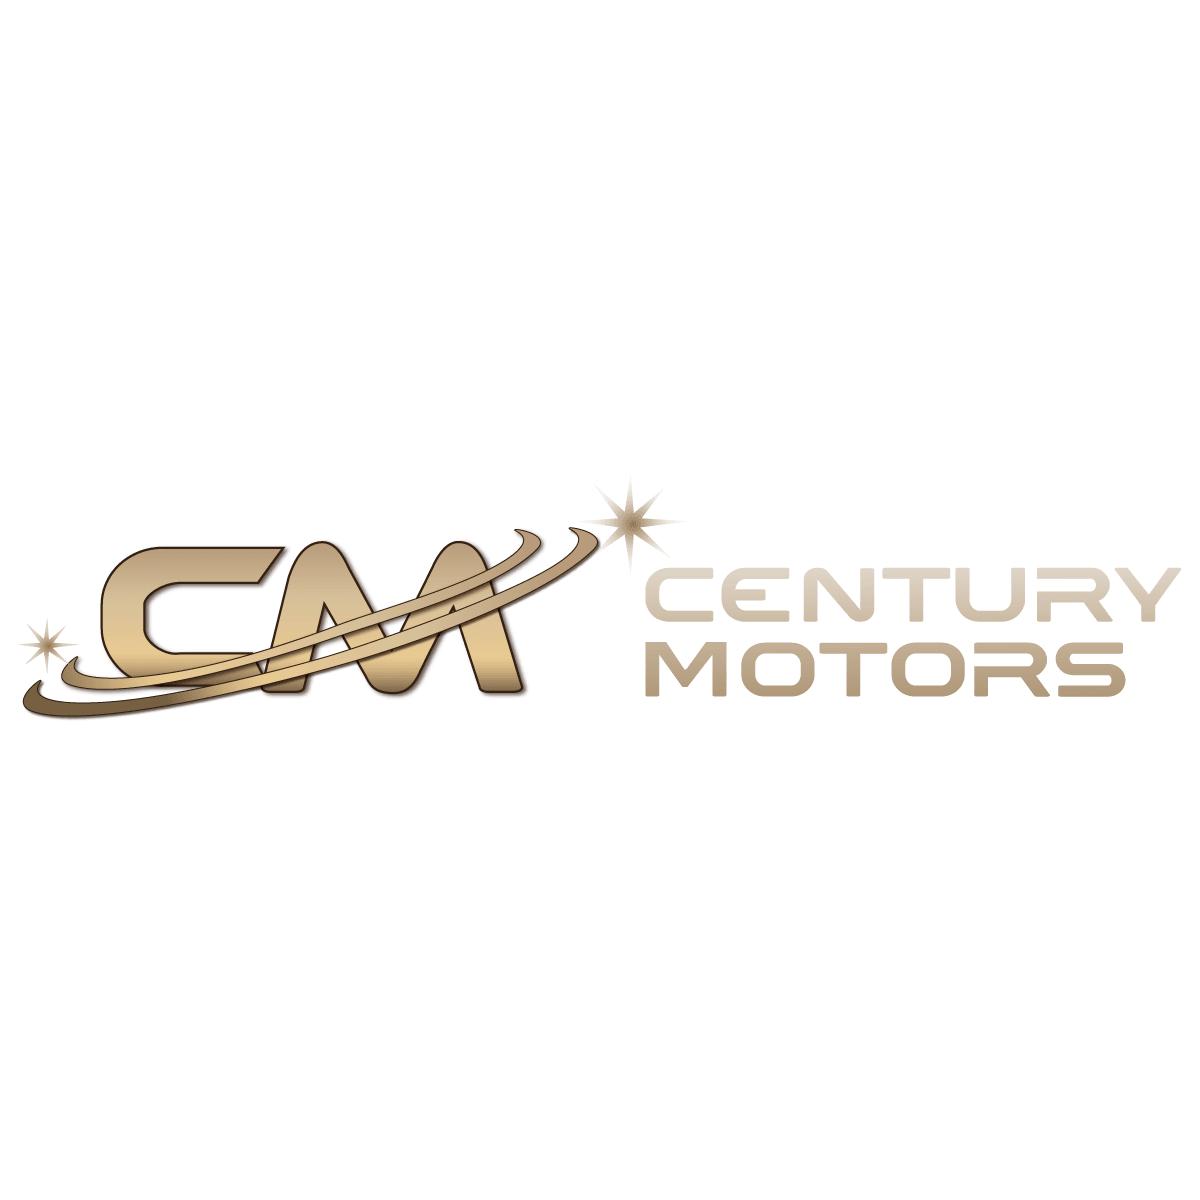 Car Dealer in CA Fresno 93703 Century Motors 4780 E Carmen Ave.  (559)454-1090